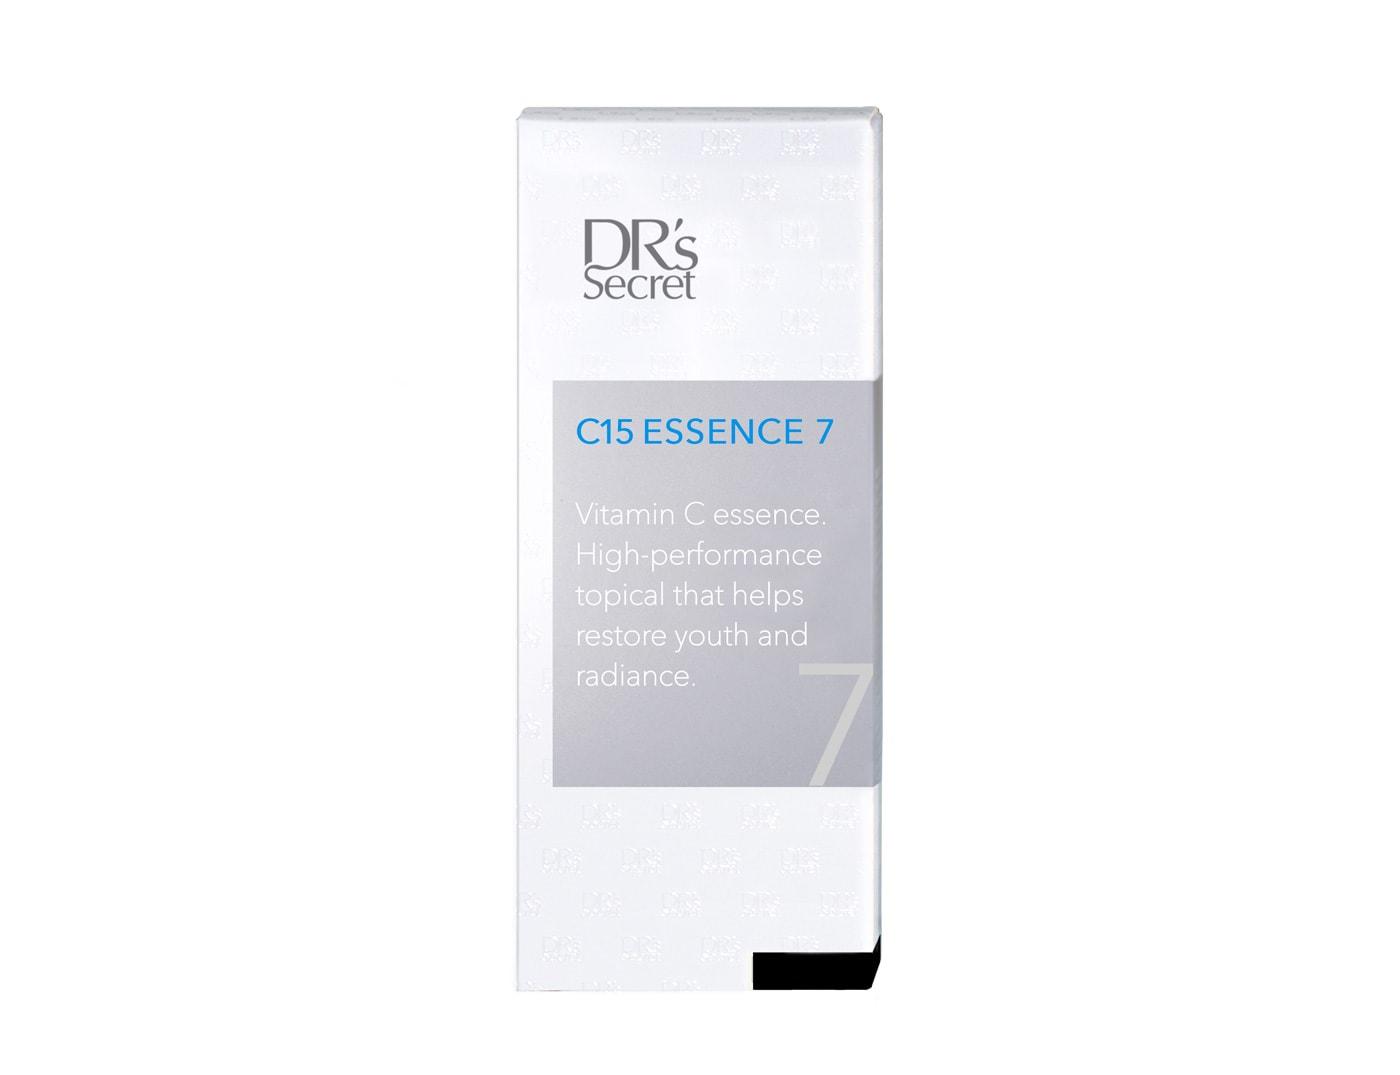 DR's Secret C15 Essence 7 box front packaging